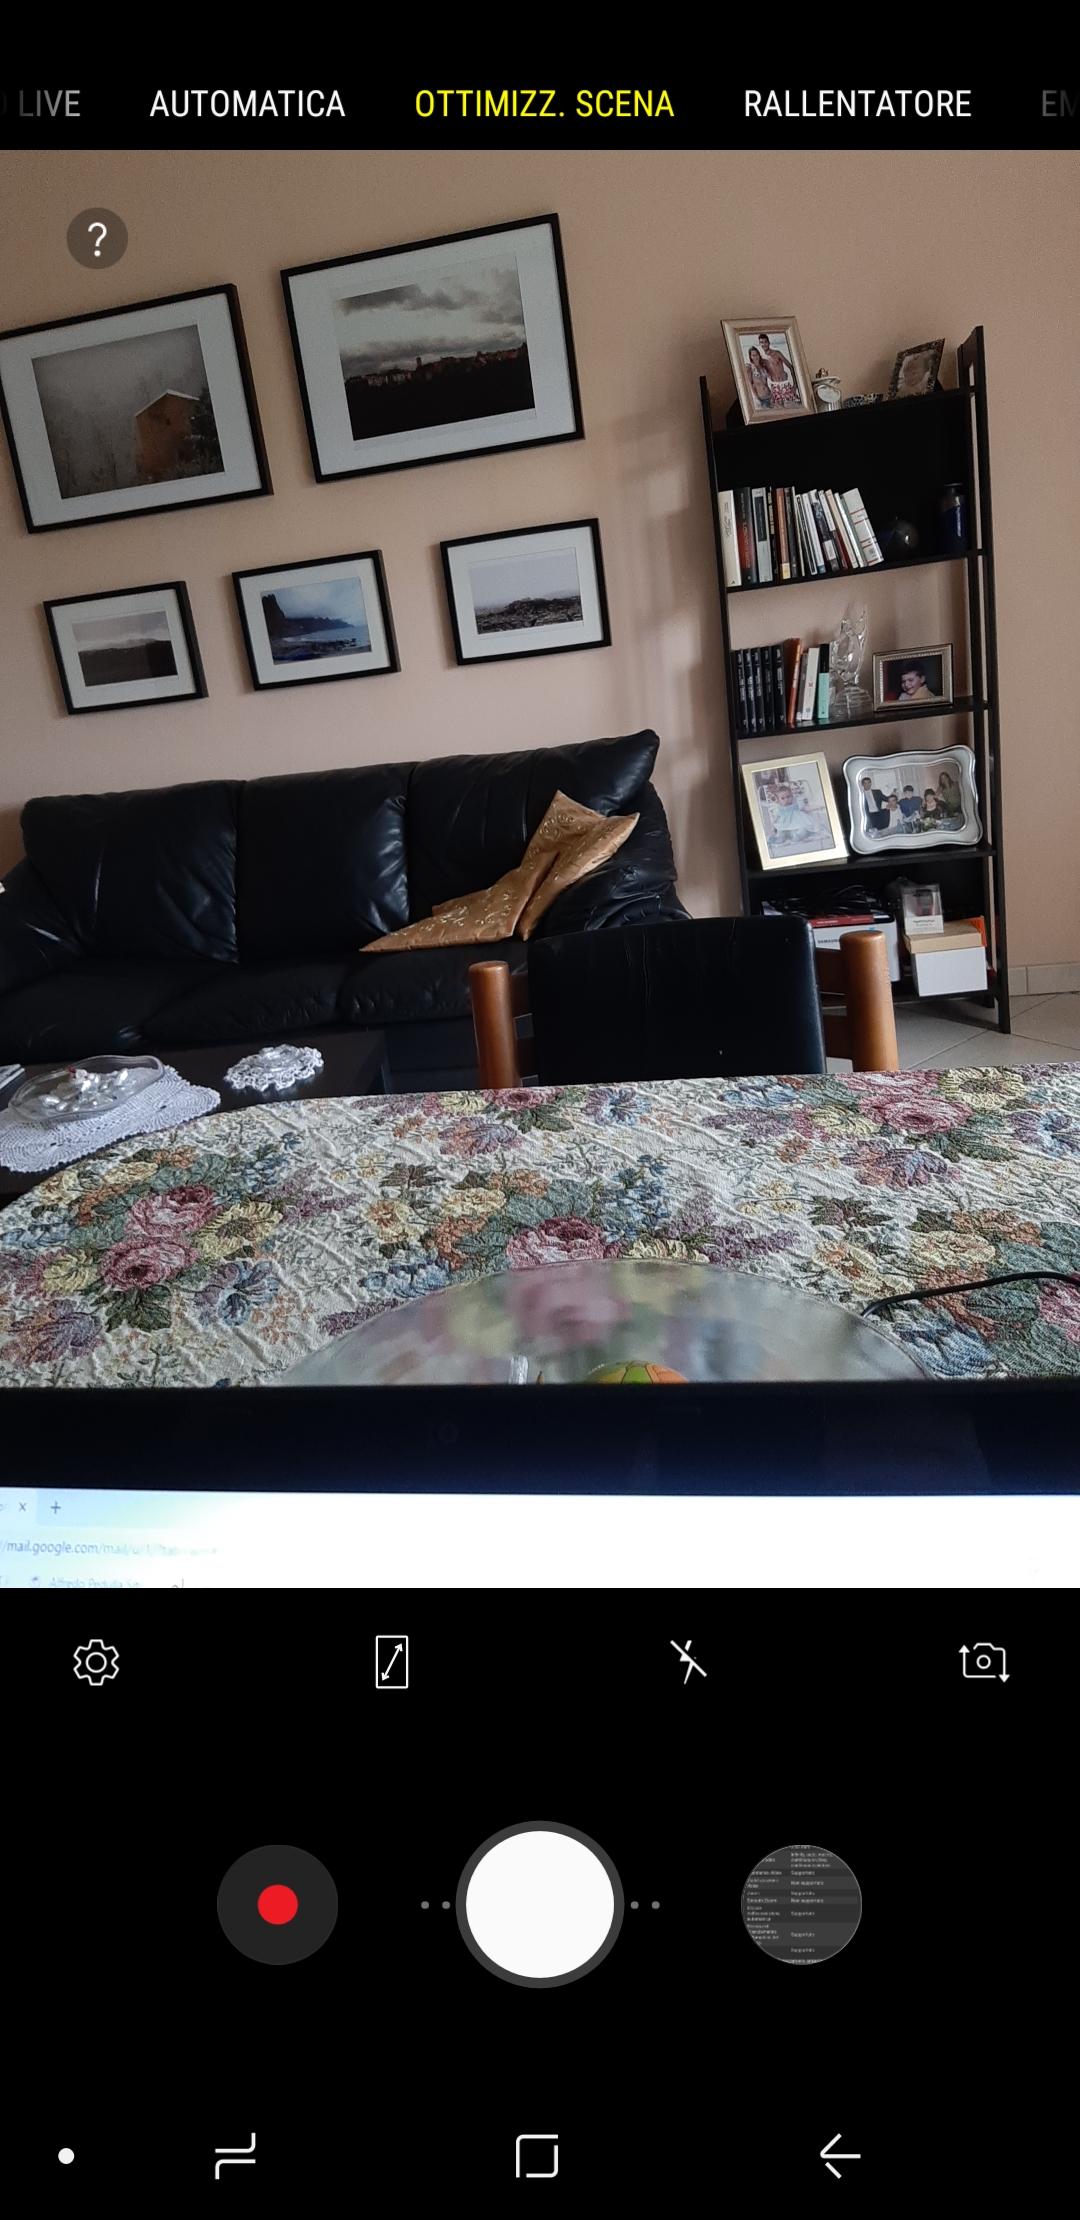 Screenshot_20181011_155854_Camera.jpg